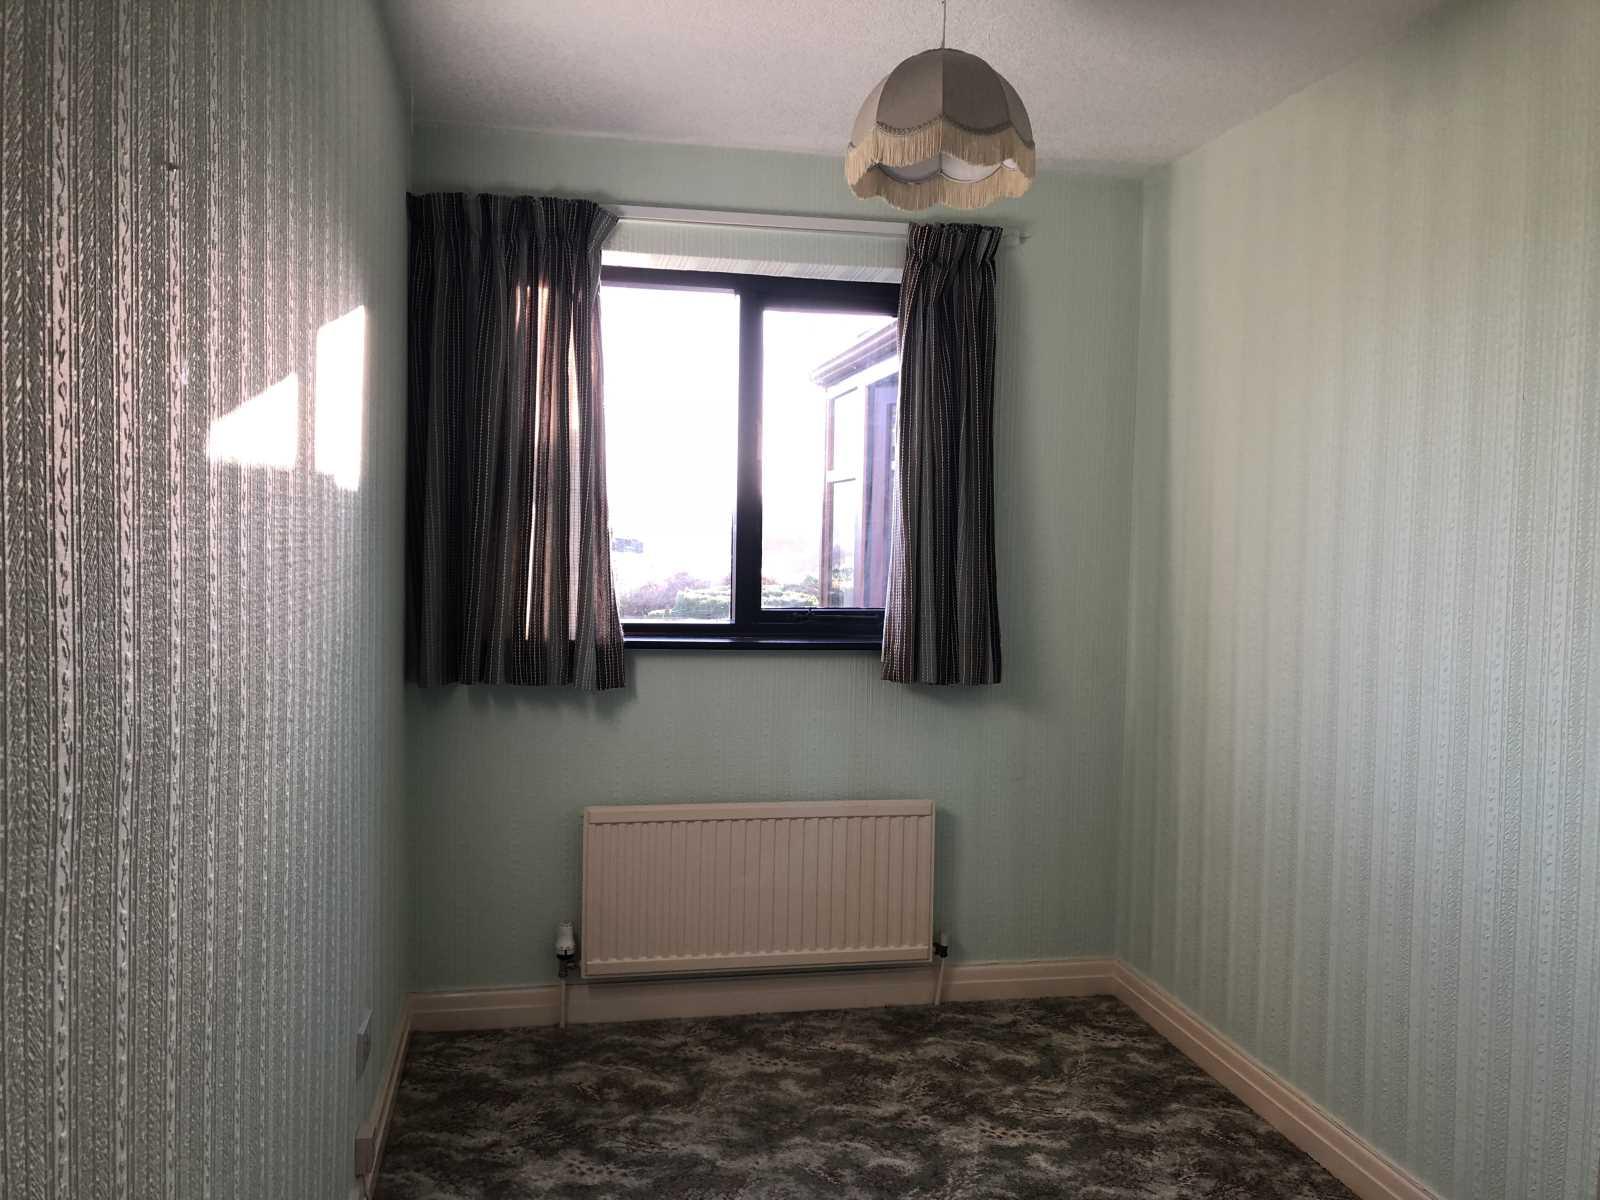 21 Lavender Court, Netherton, Huddersfield, HD4 7LW